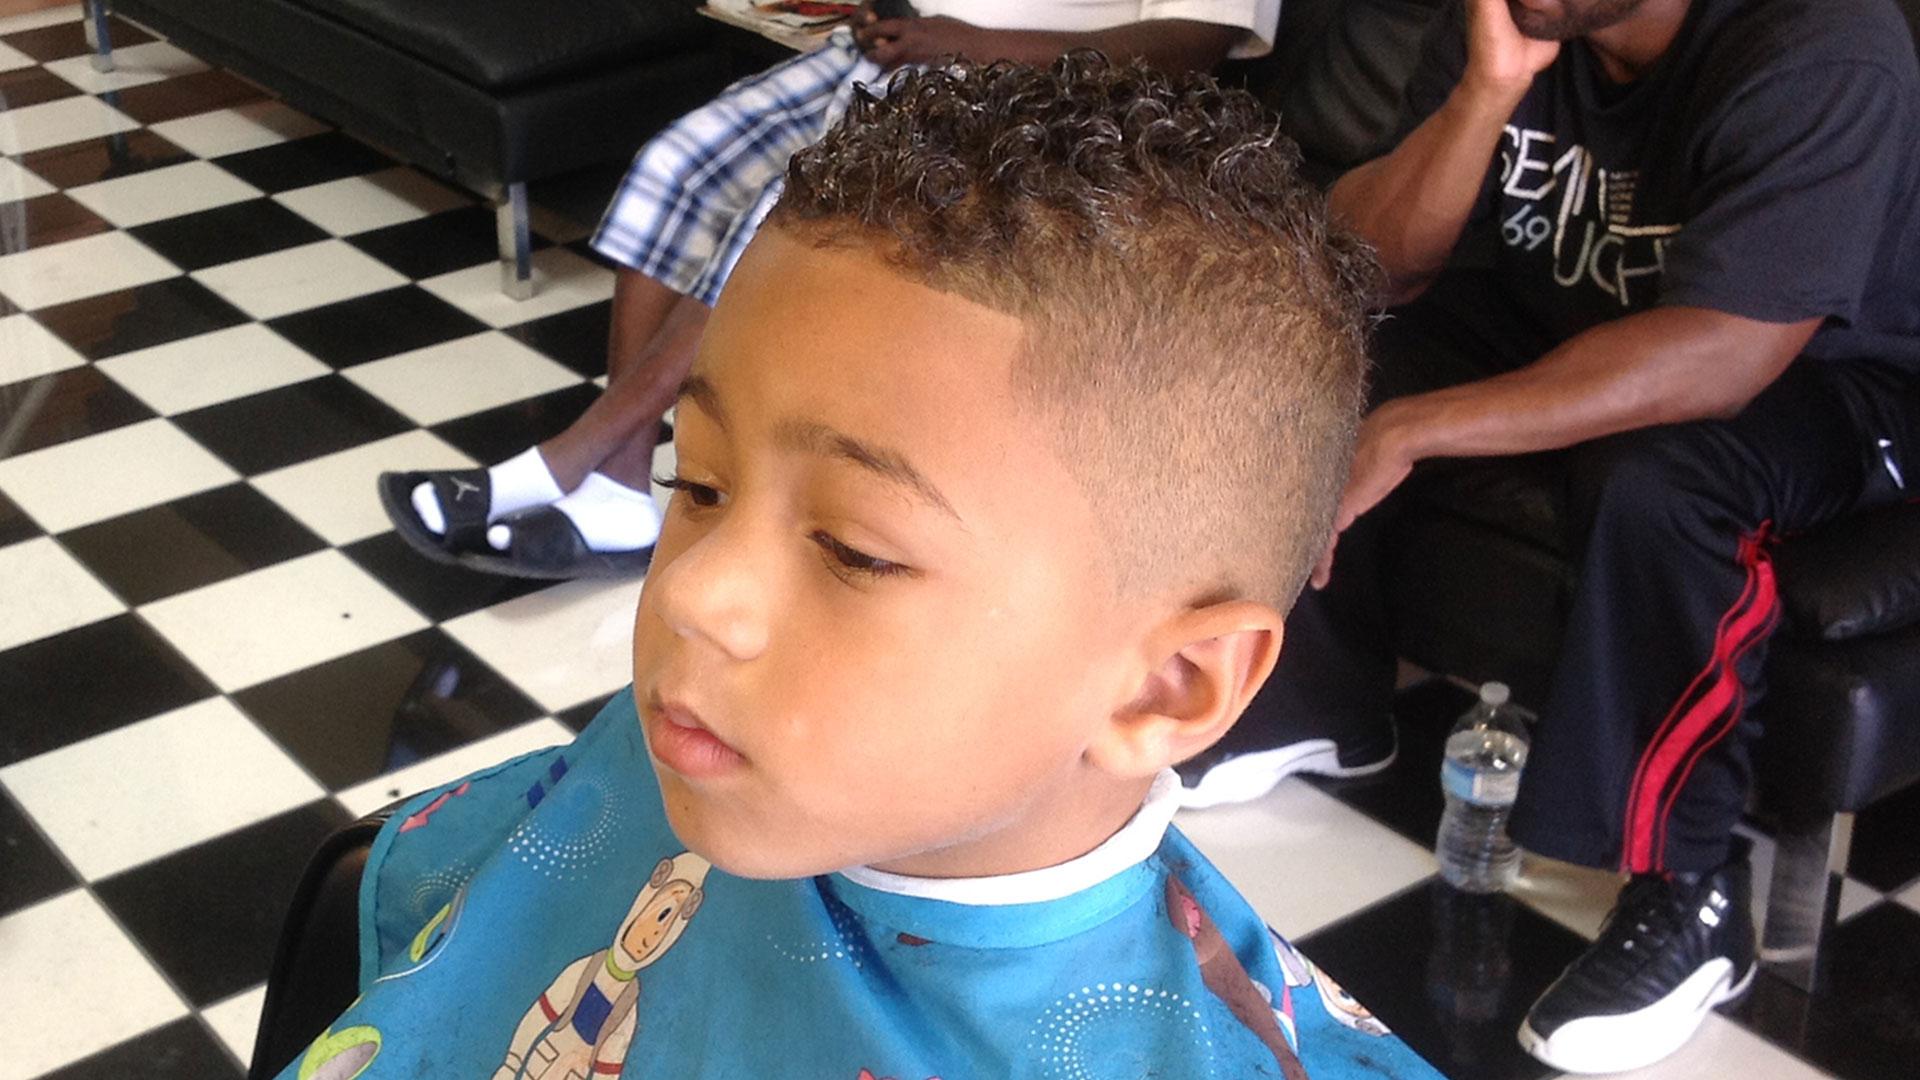 Fohawk haircut for kids